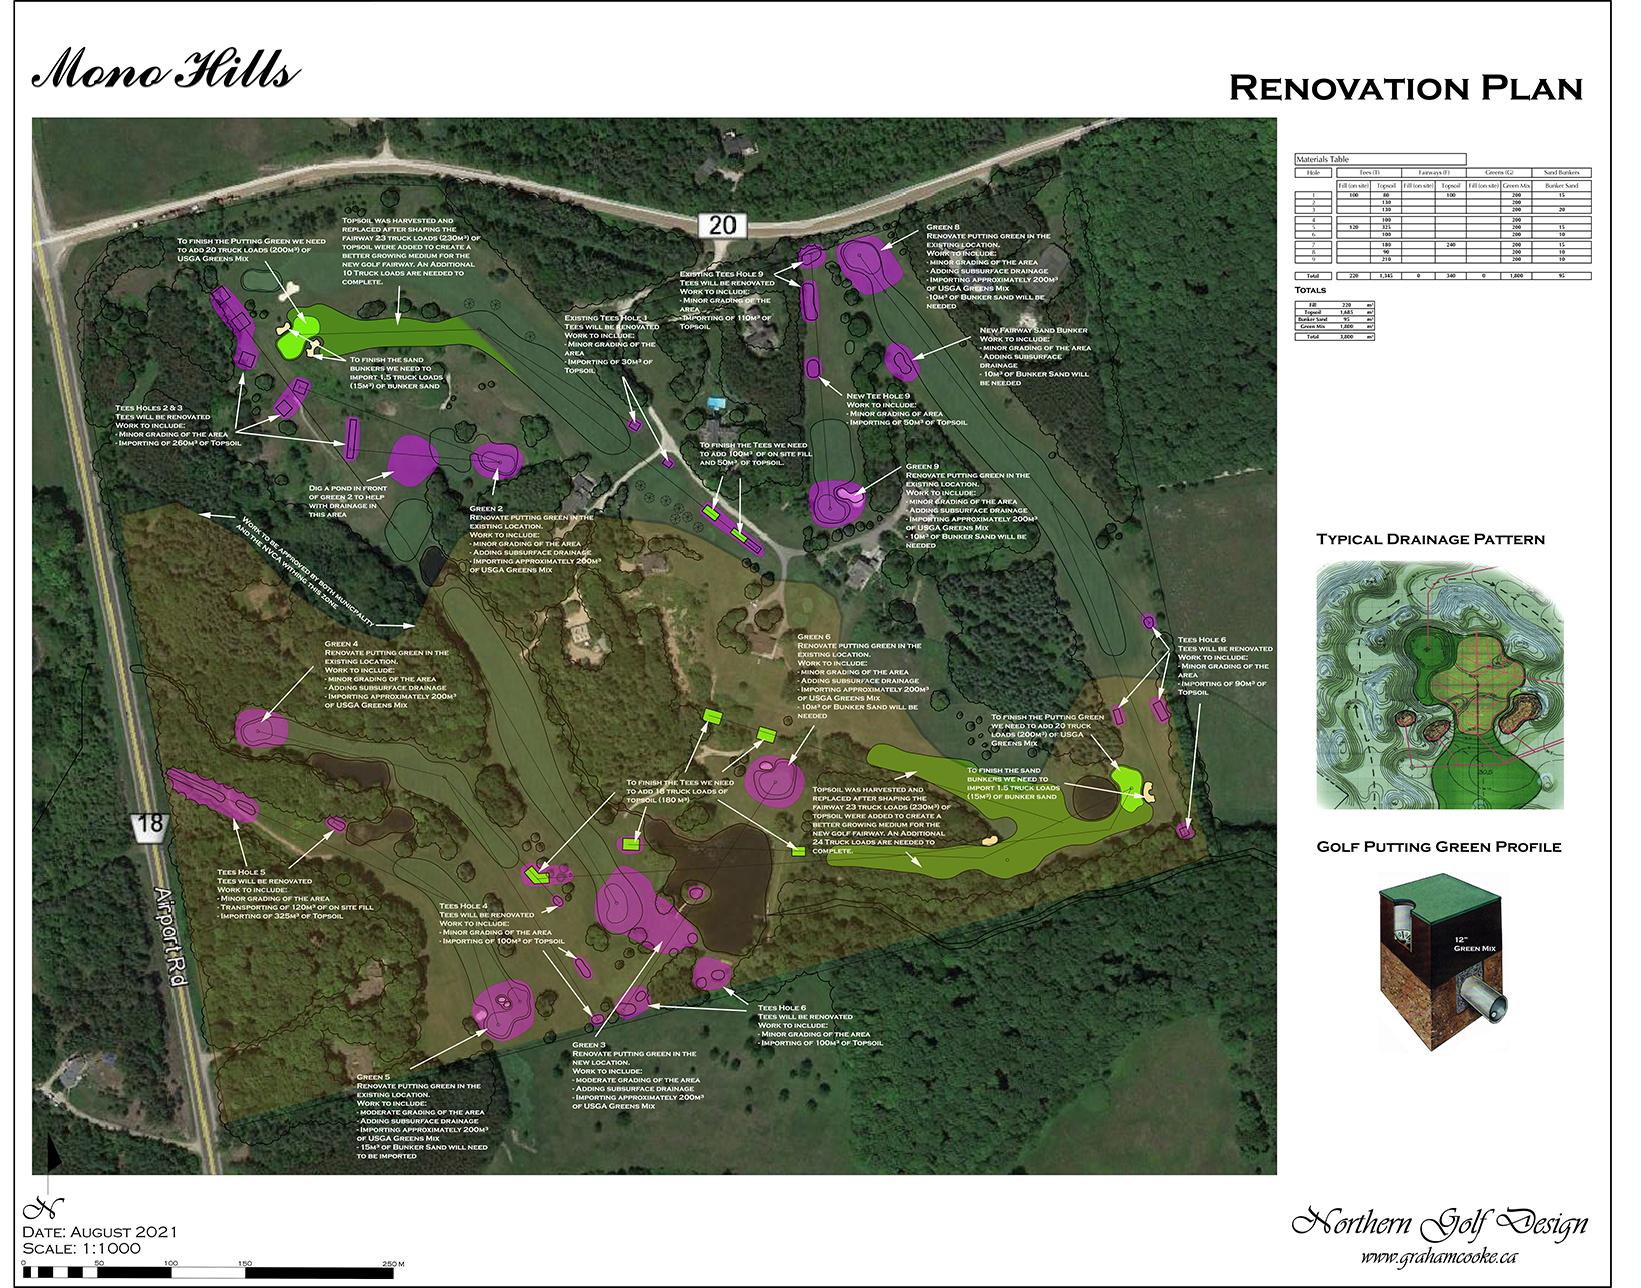 Mono Hill Golf Course Renovation Plan